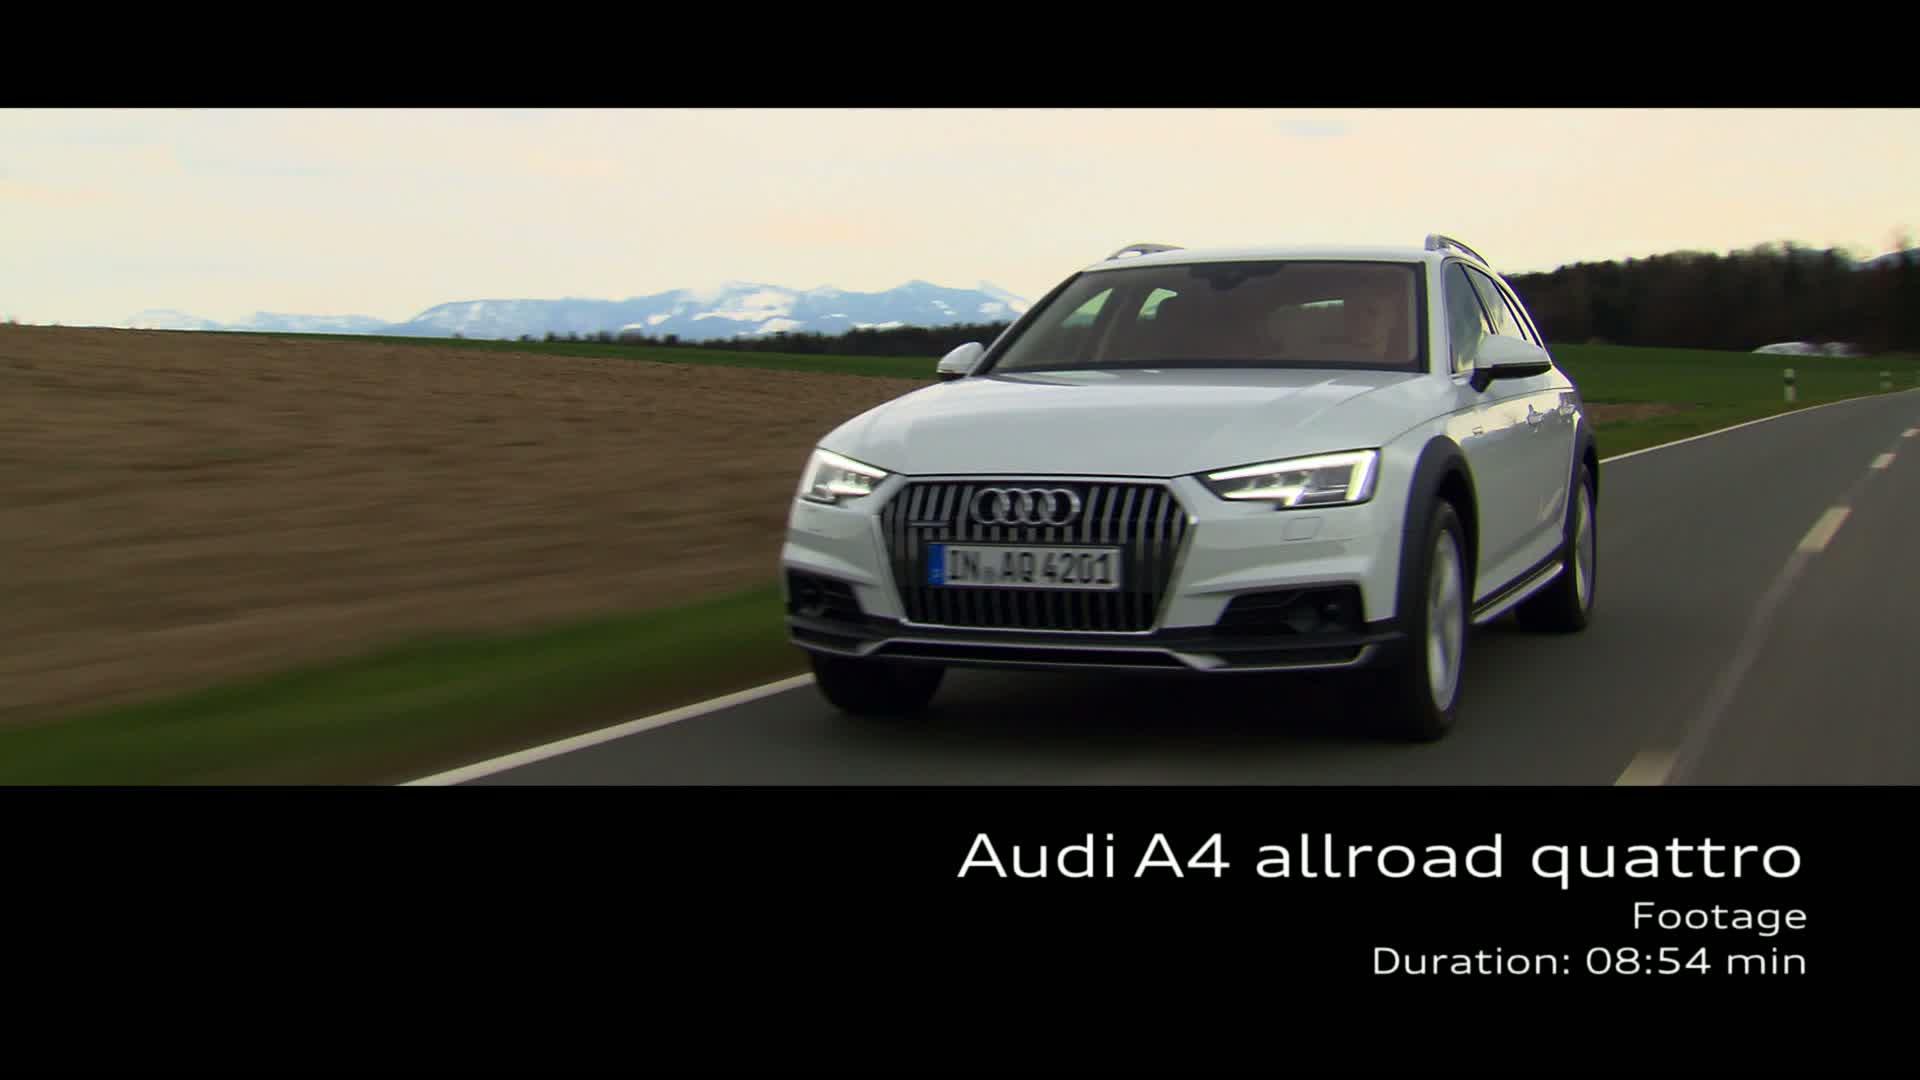 Audi A4 allroad quattro - Footage on Location